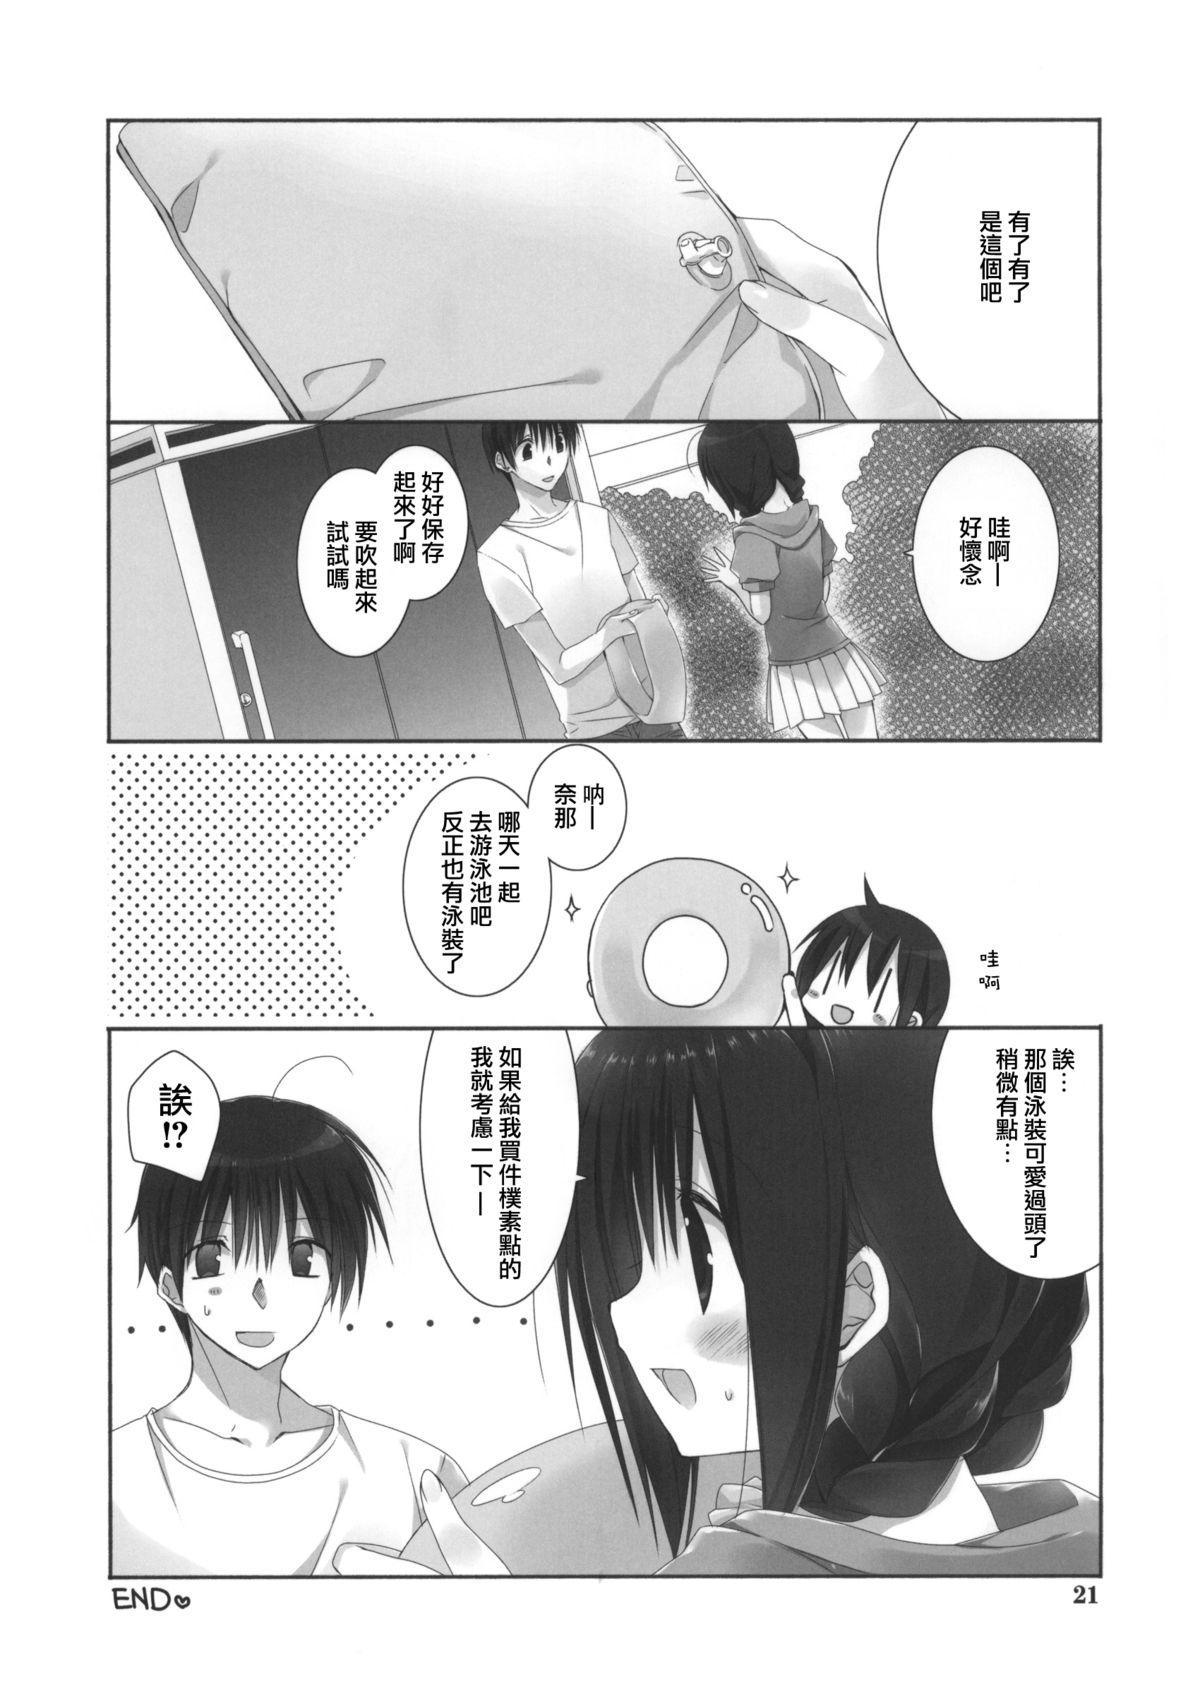 Imouto no Otetsudai 5 + Paper 20